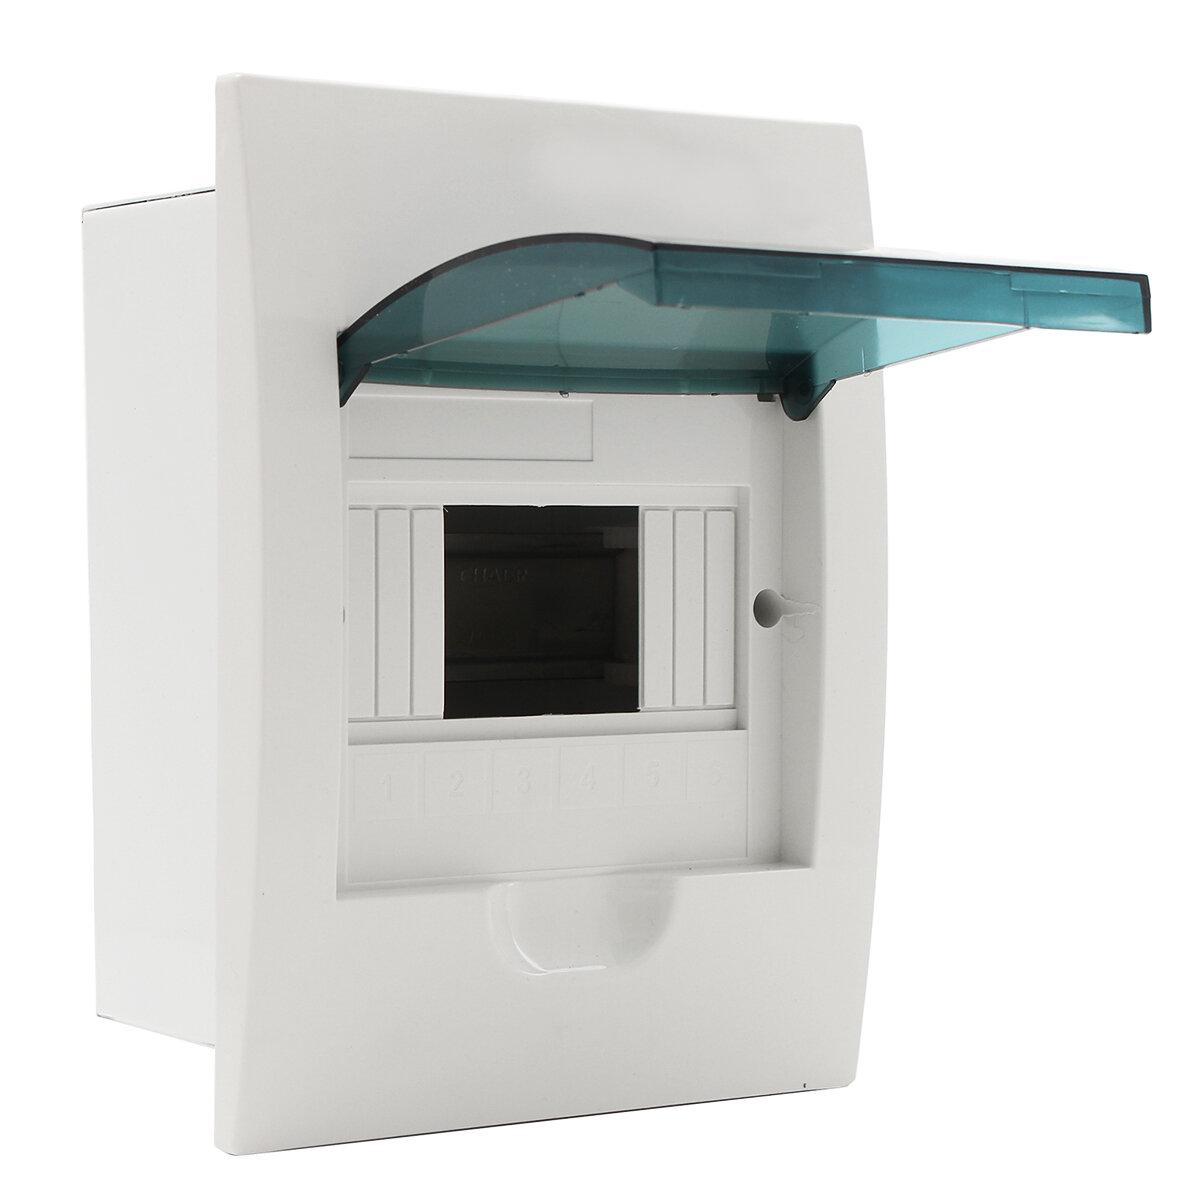 60A Power Distribution Box Eletronic Circuit Switch Safe Fuse Box on